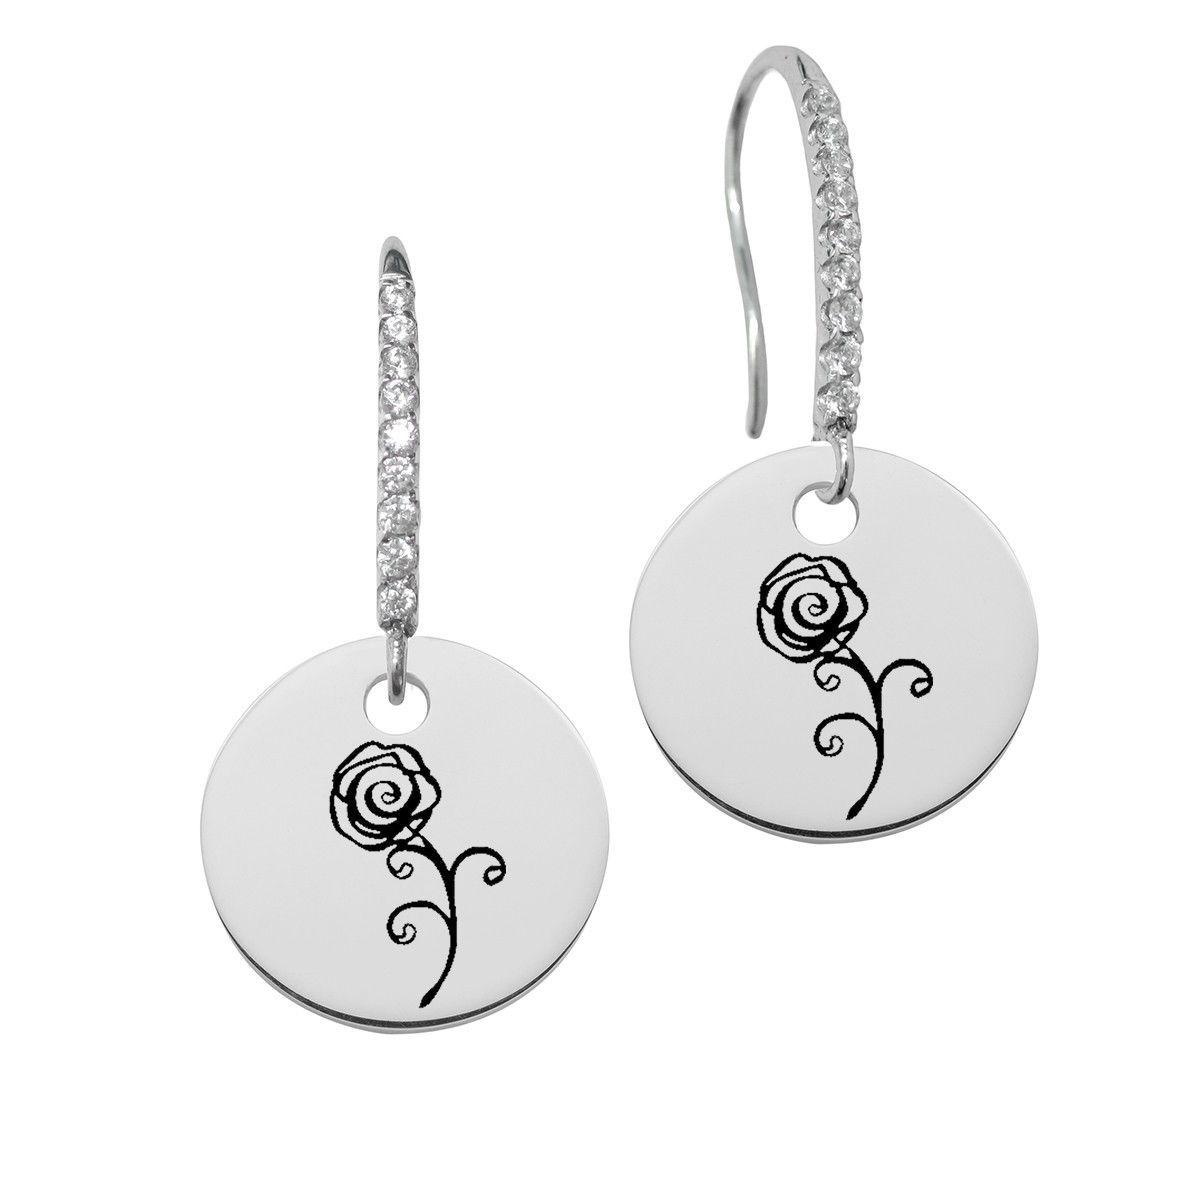 Alpha omicron pi symbol round charm and cz earring in solid alpha omicron pi symbol round charm and cz earring in solid sterling silver biocorpaavc Gallery